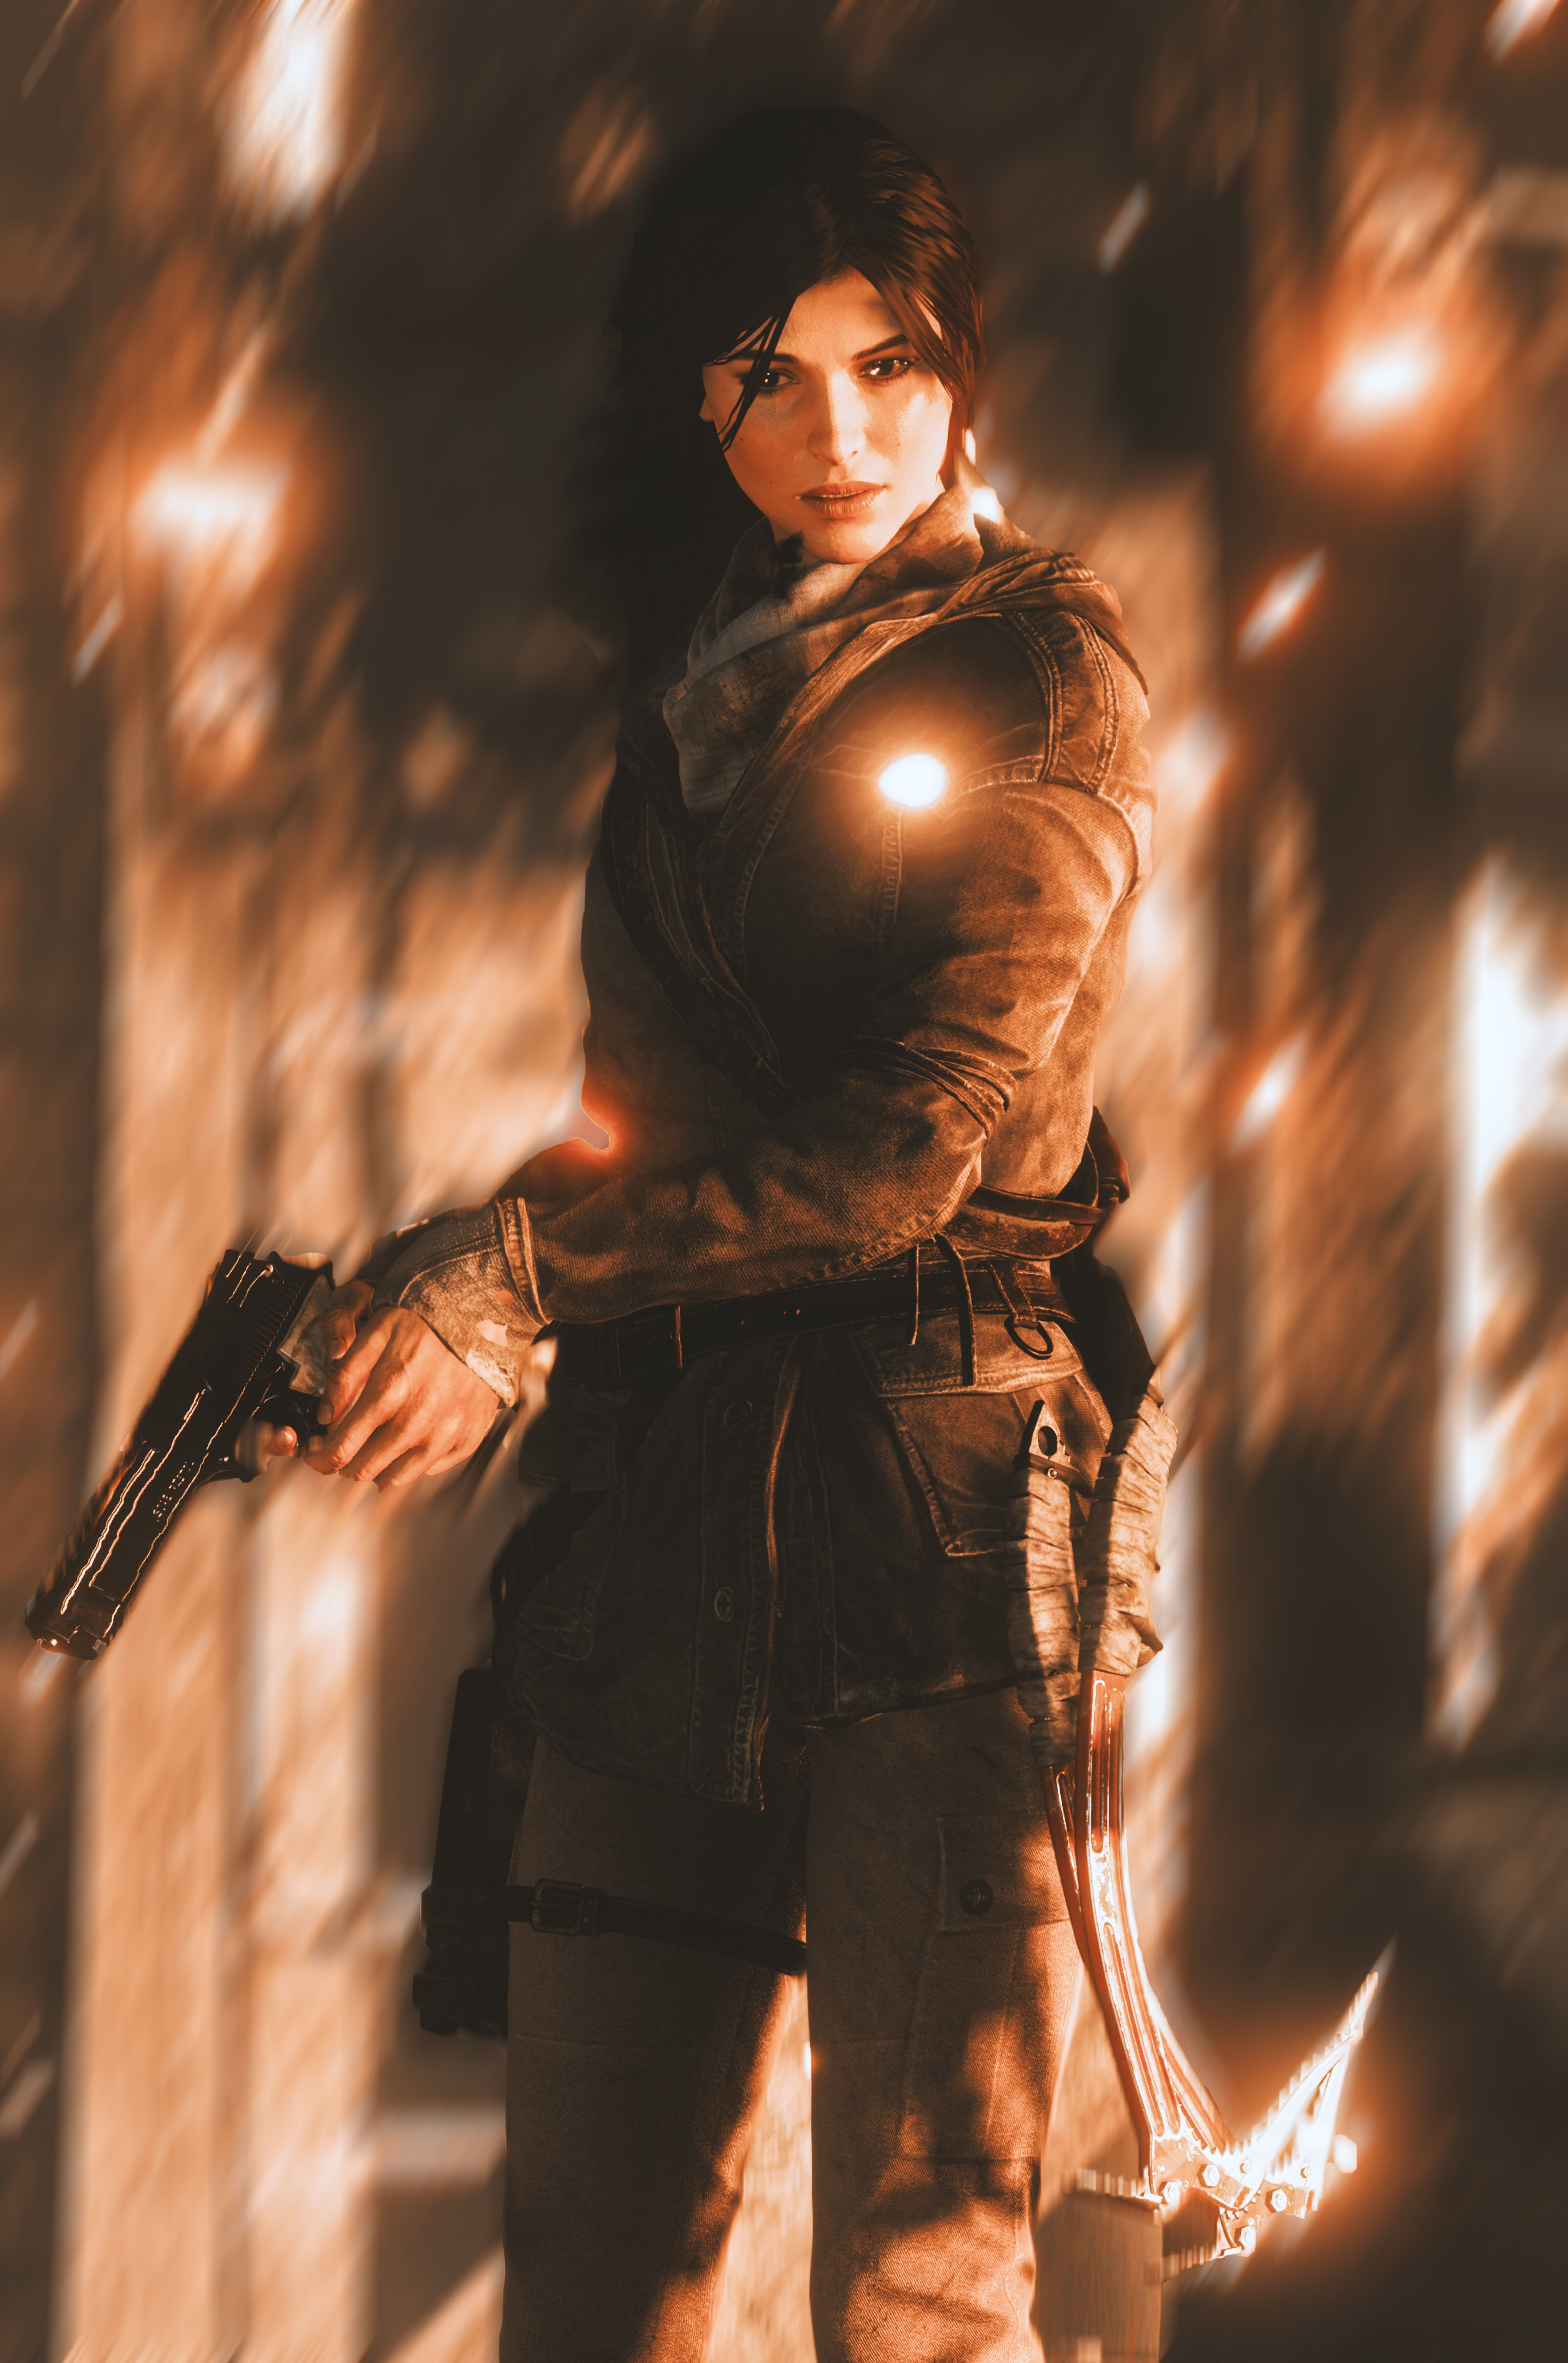 Pin by Rick Grimes on Lara Croft | Tomb raider lara croft